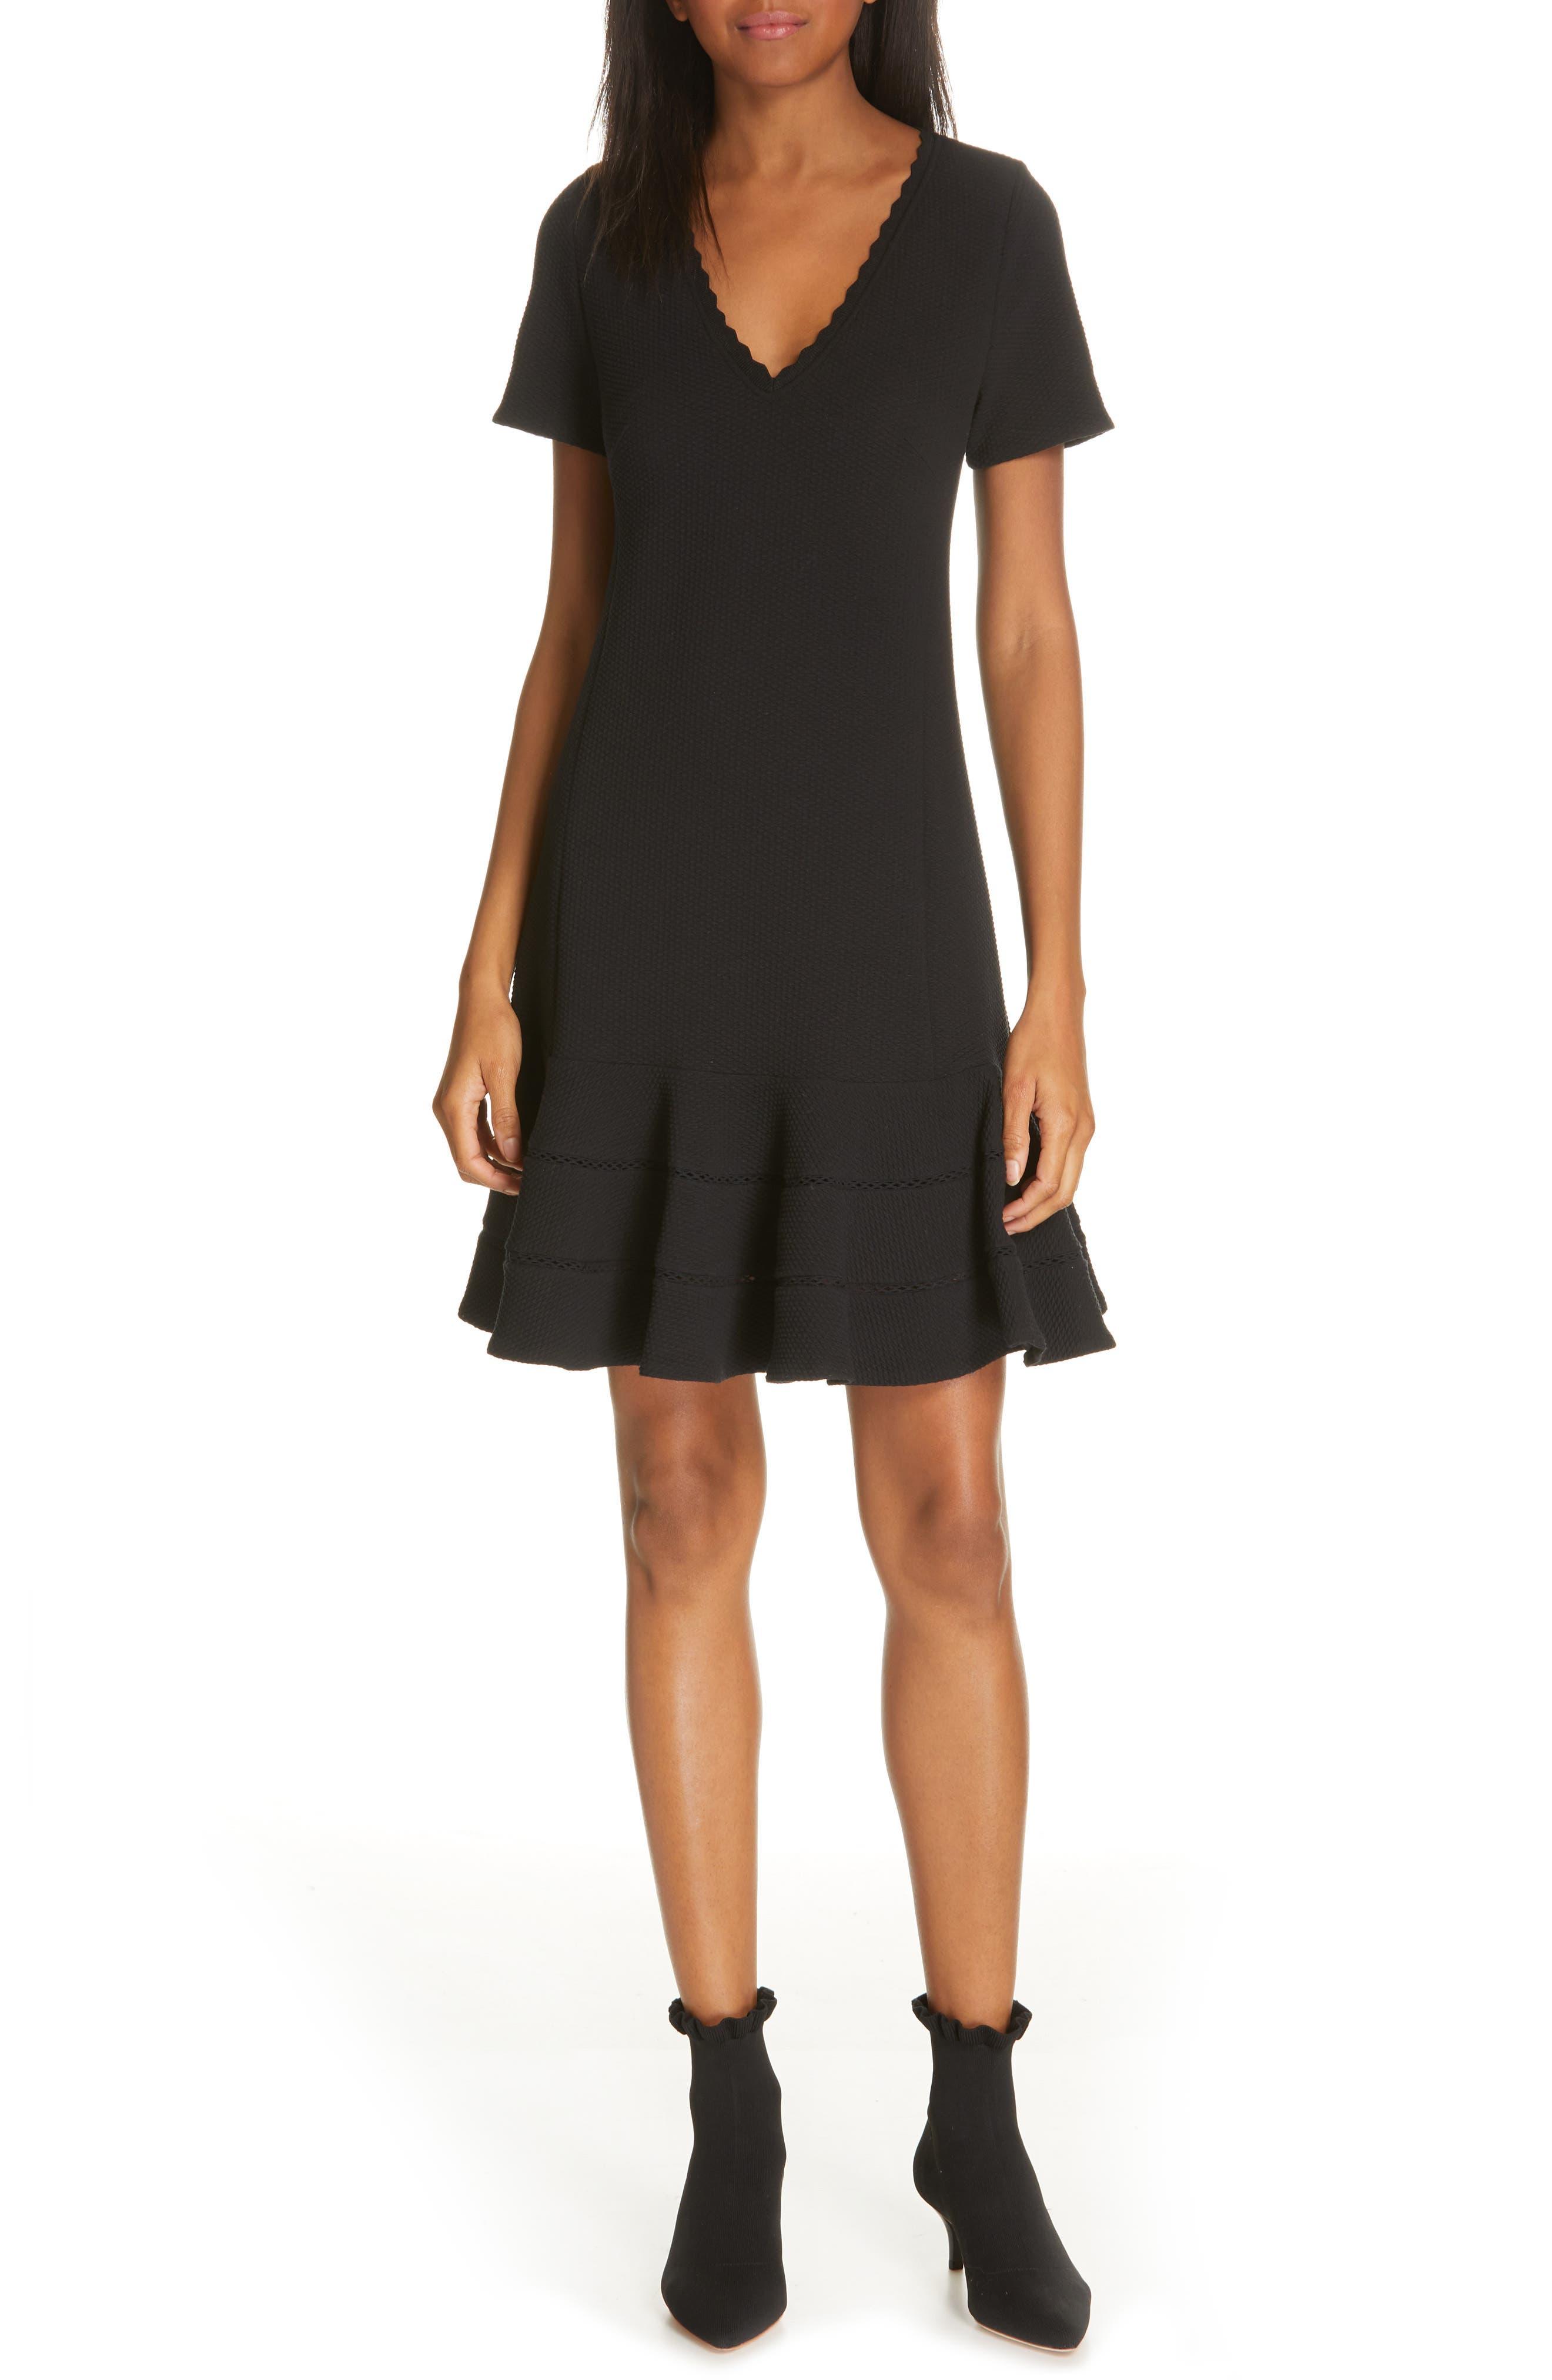 REBECCA TAYLOR, Fit & Flare Dress, Main thumbnail 1, color, BLACK